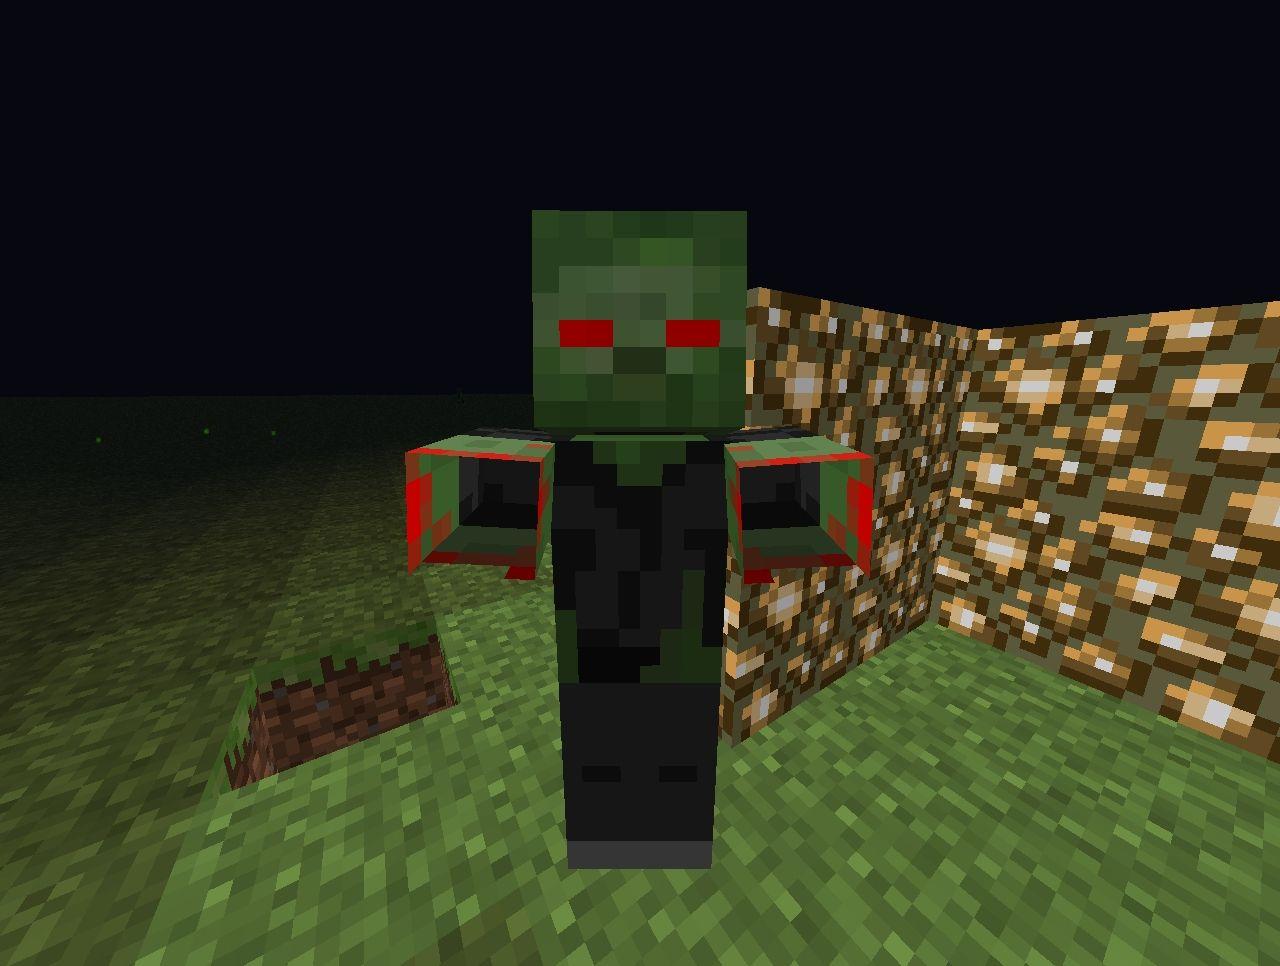 Zombie Apocalypse Texture Pack Minecraft Texture Pack